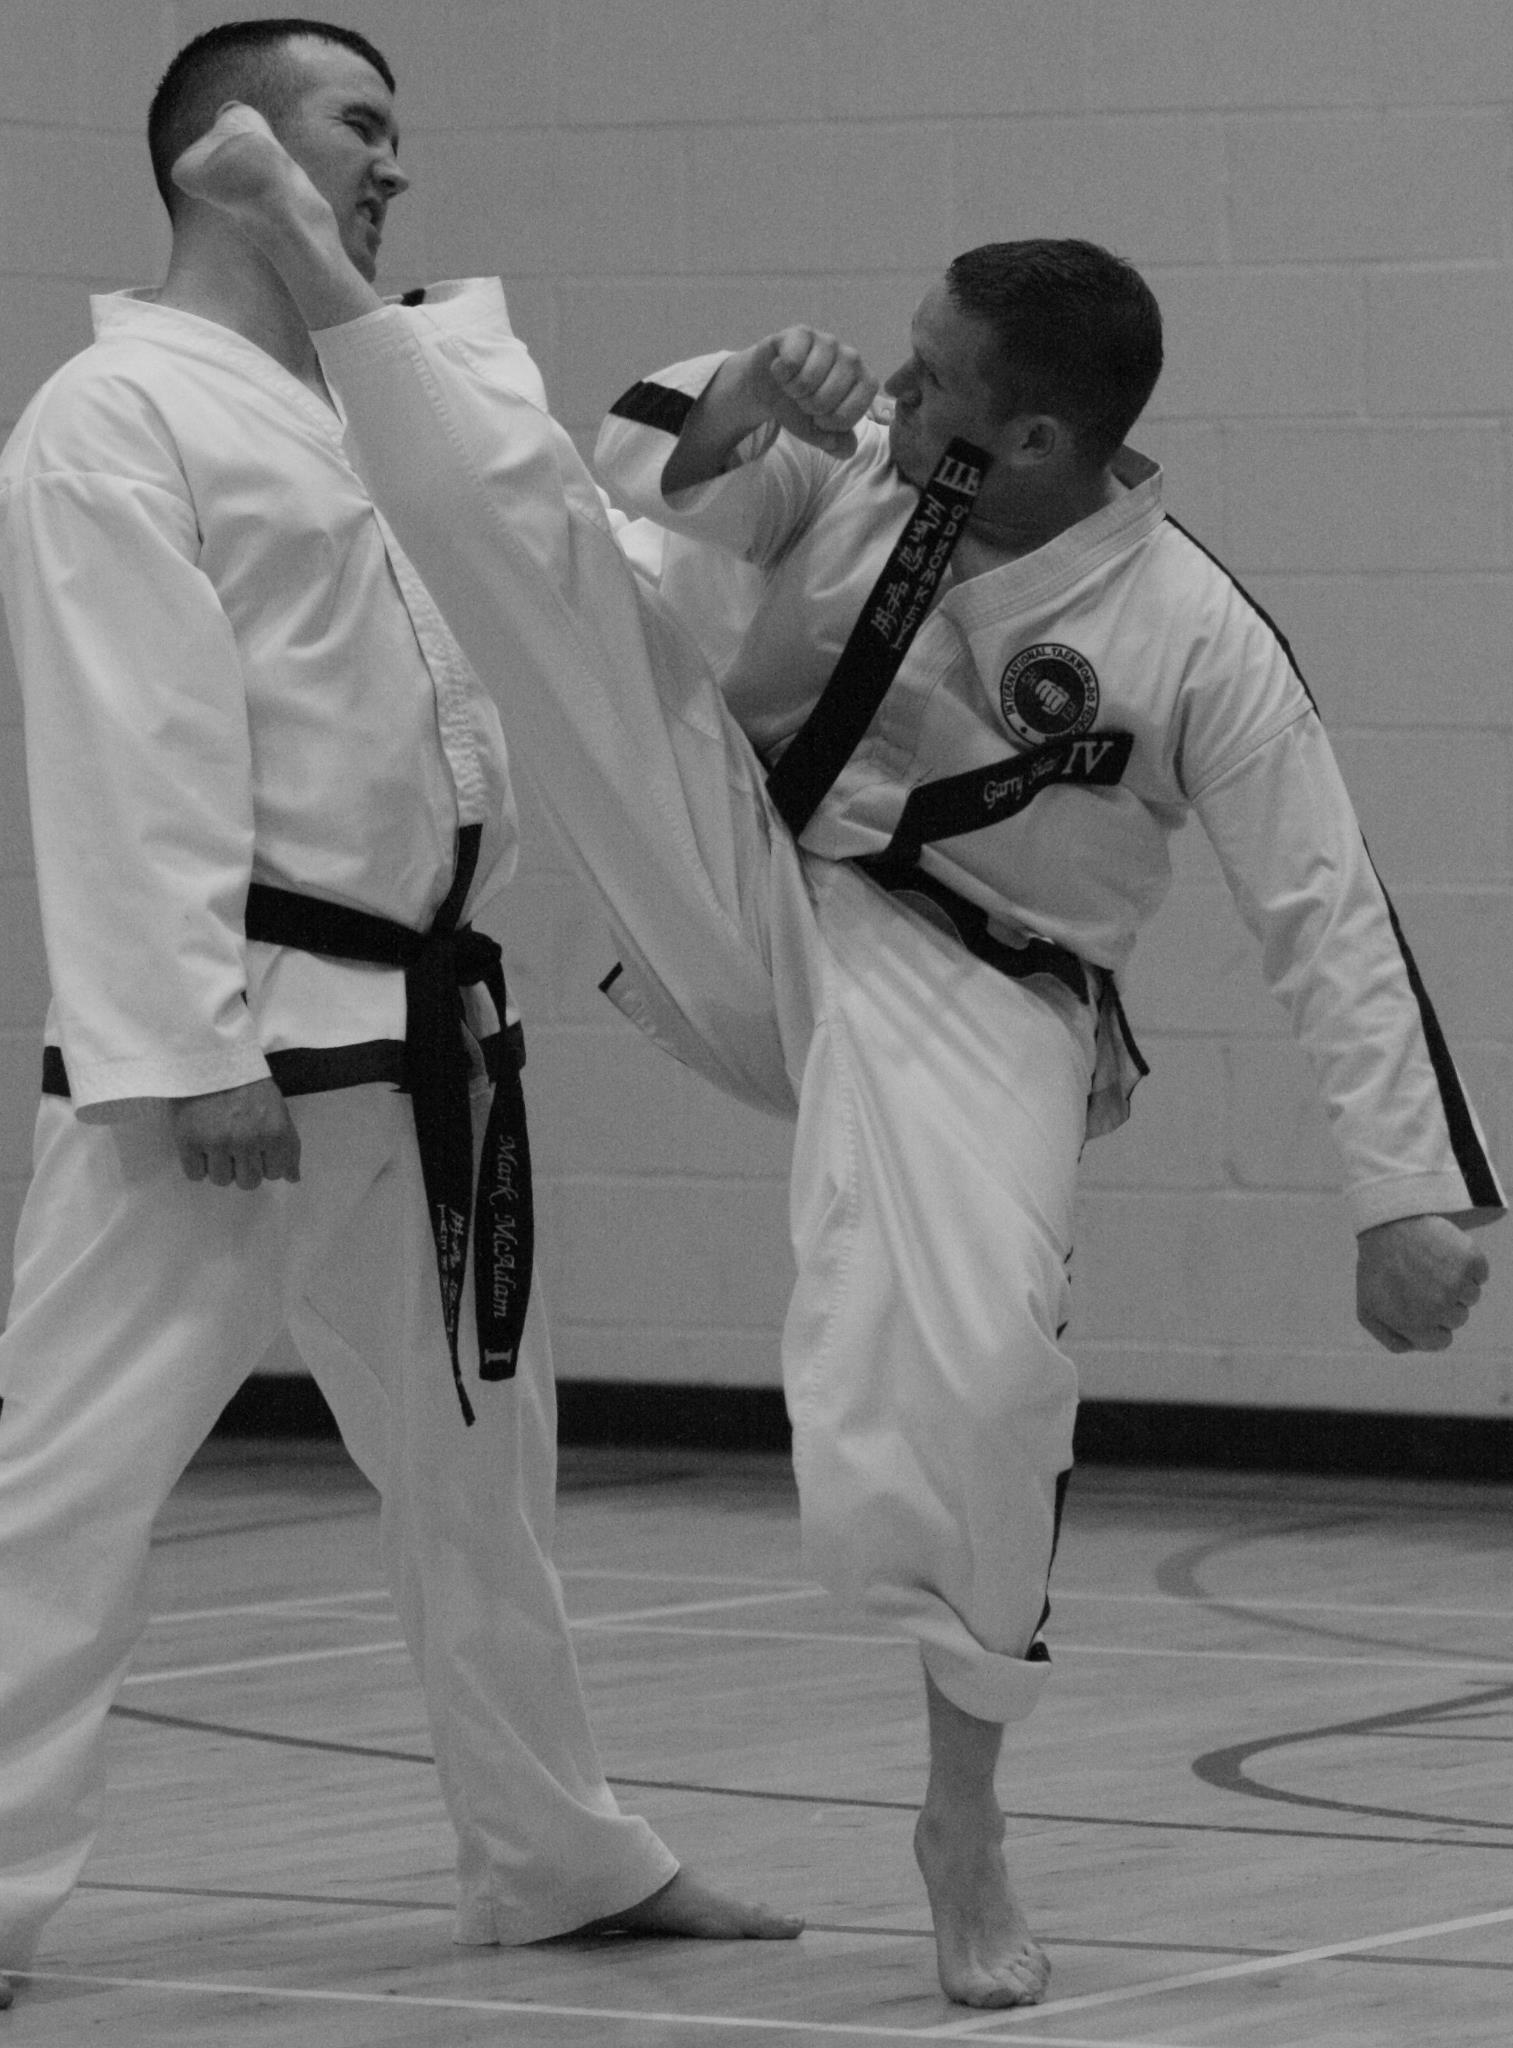 Garry Shaw executing high kick